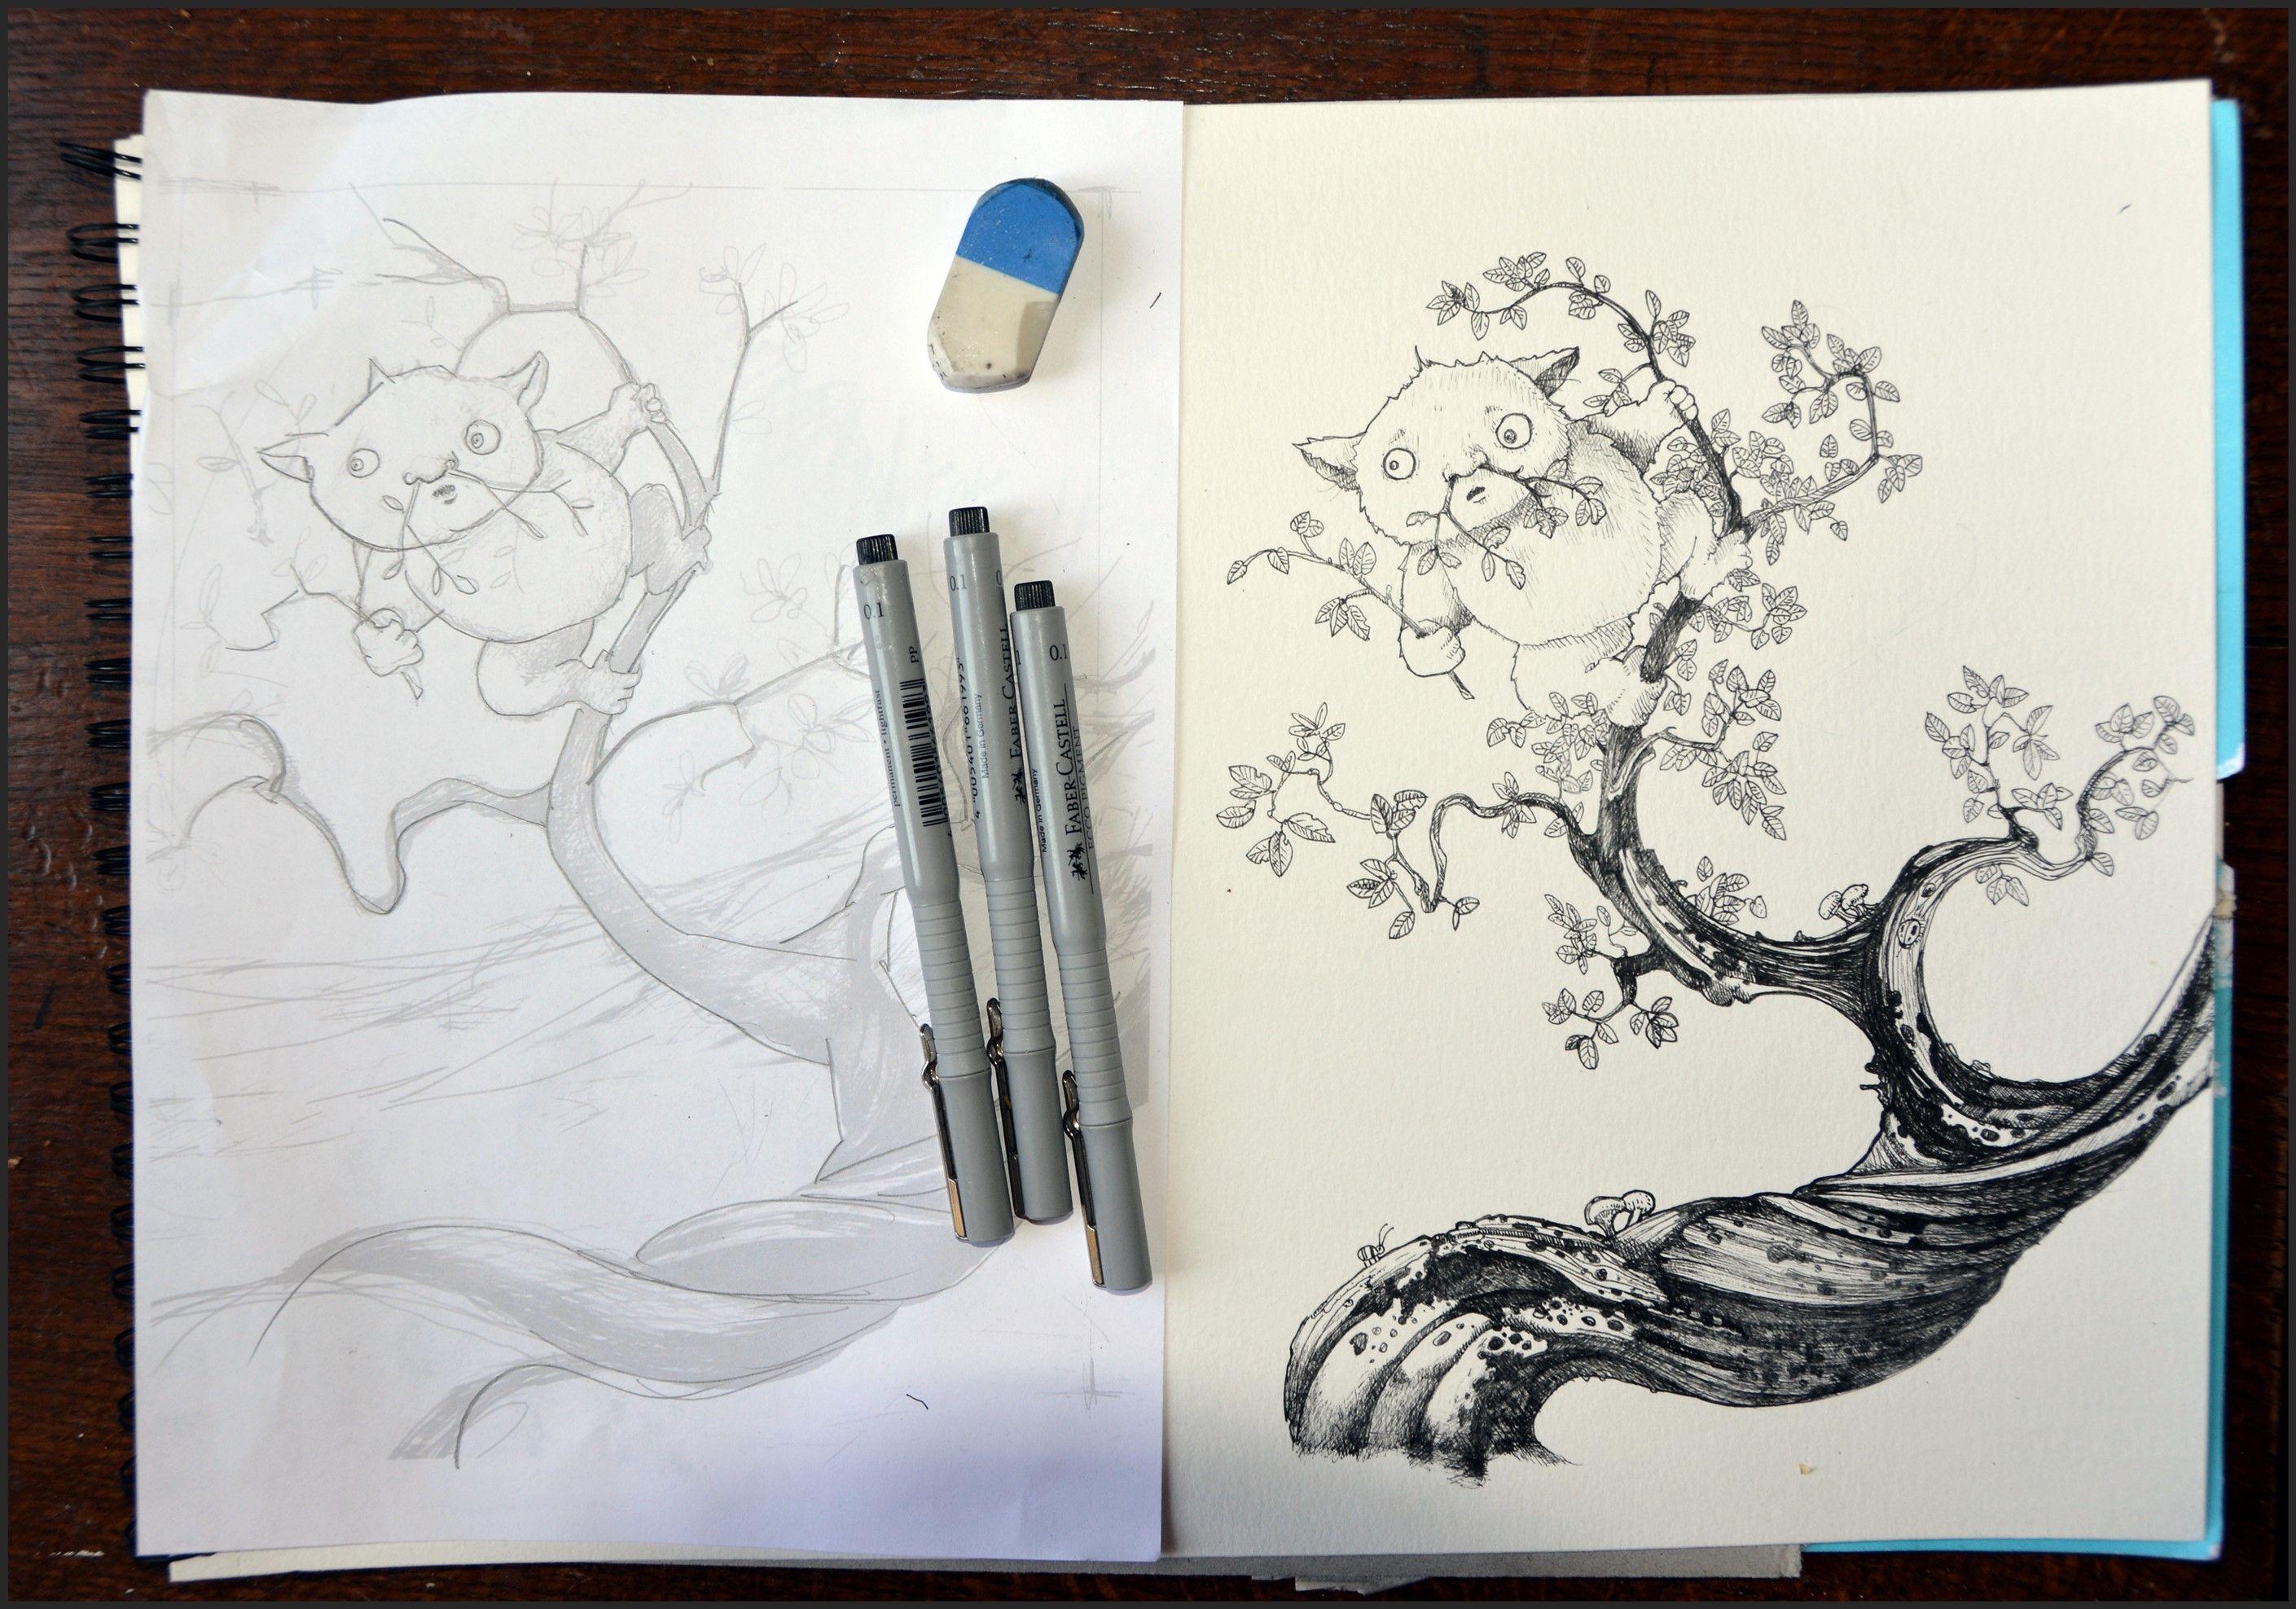 Sketch of Splot Andrew Tong Art